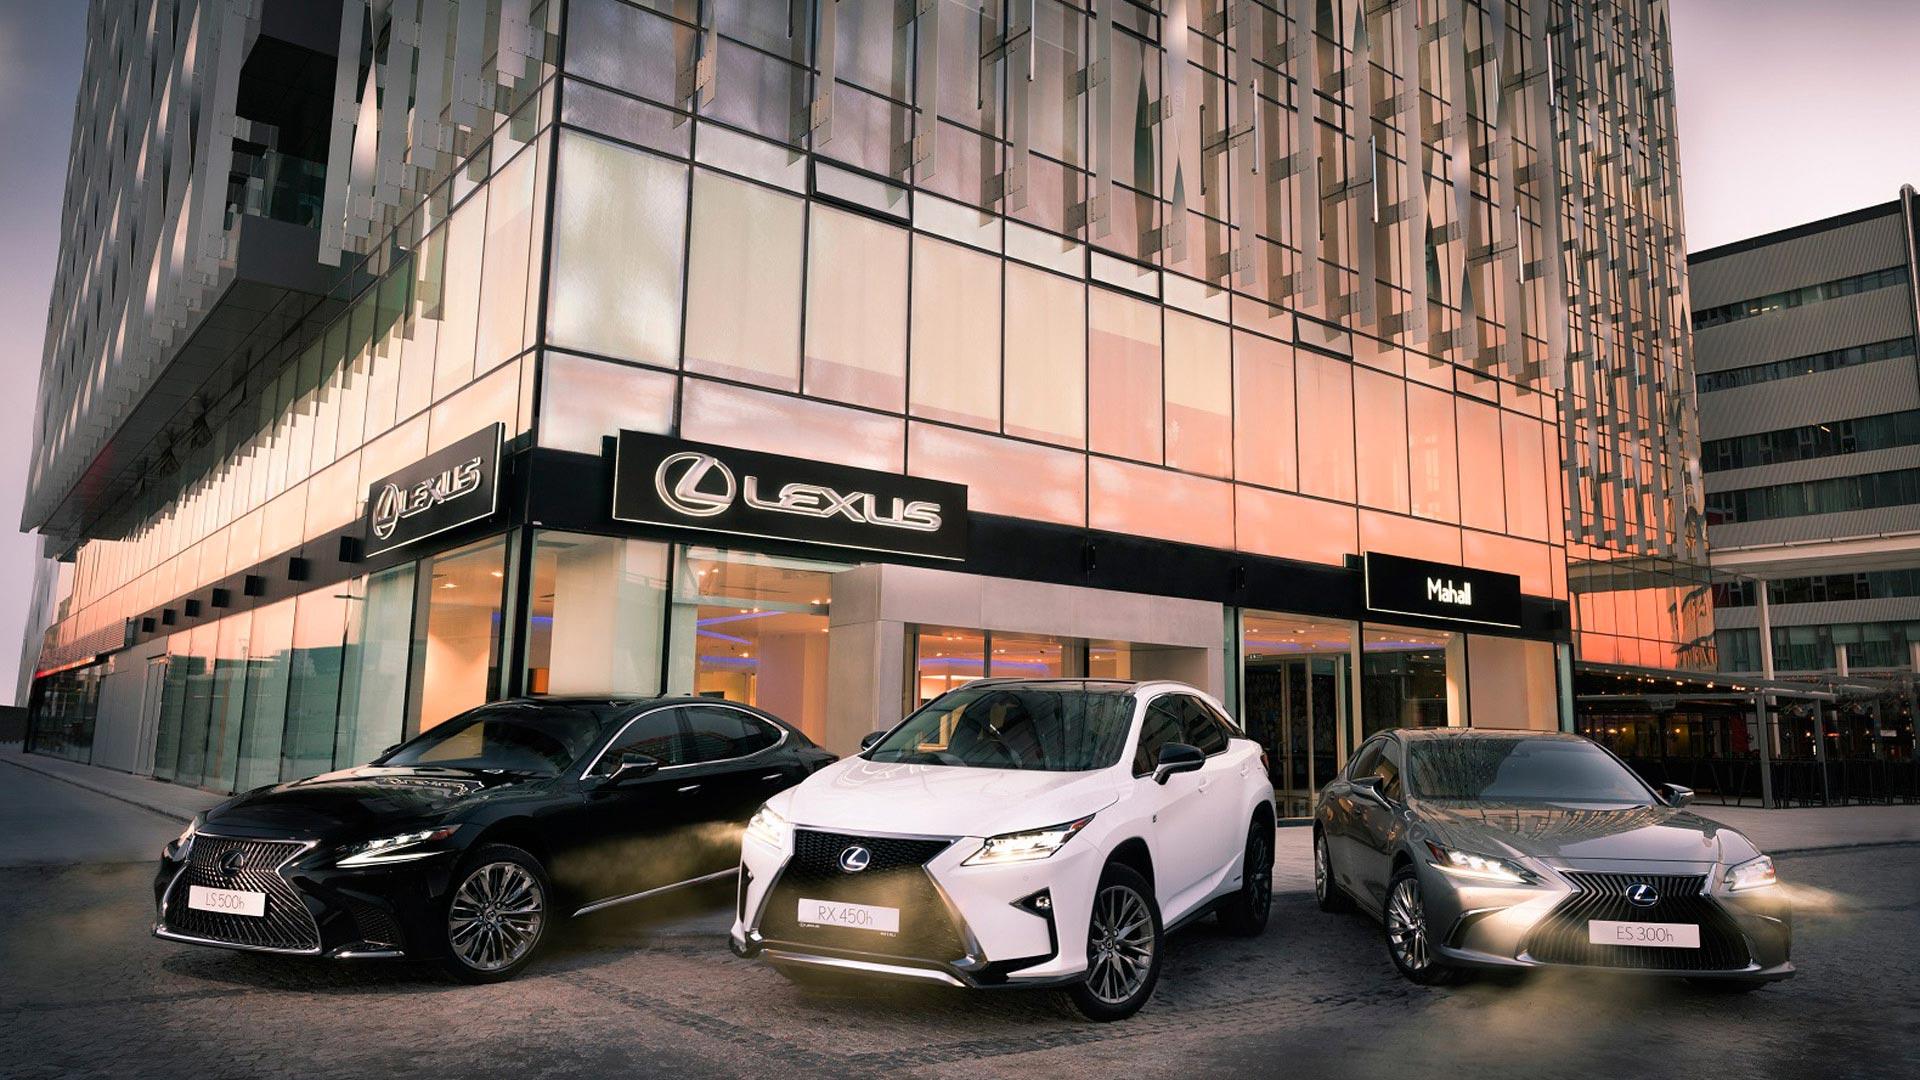 Lexus Mahall Ankara gallery01 v2